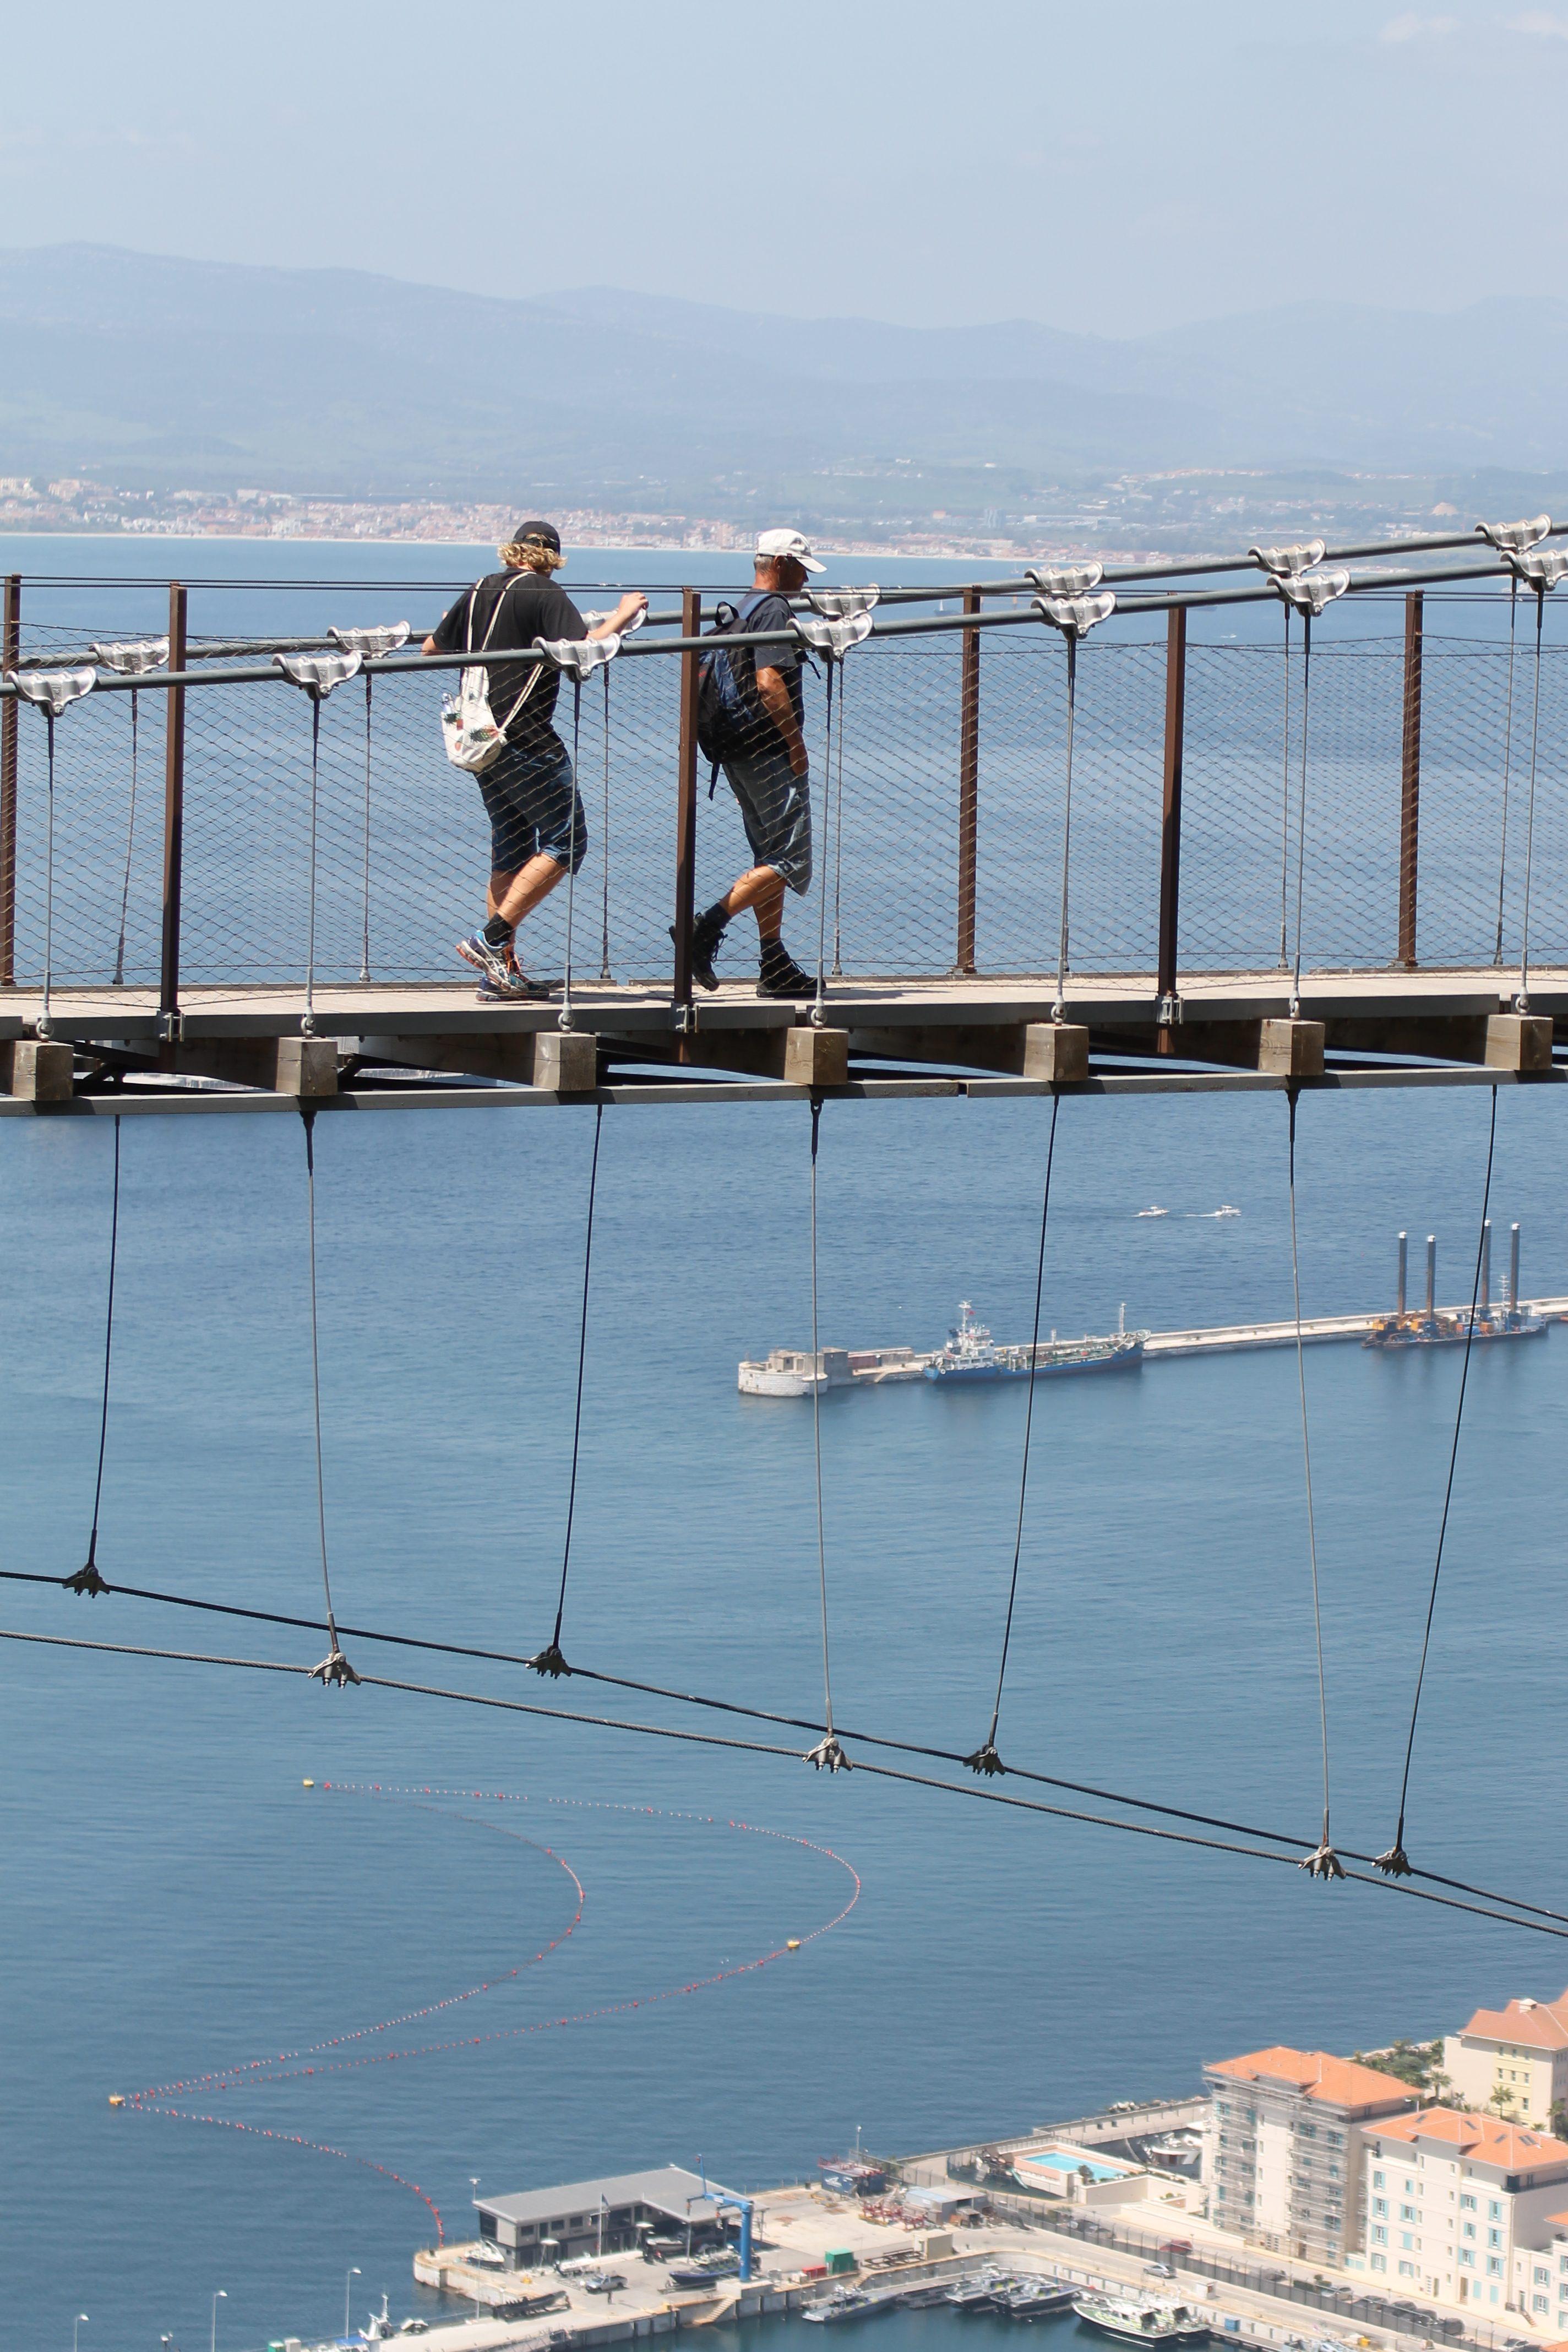 Modige mennesker på broen